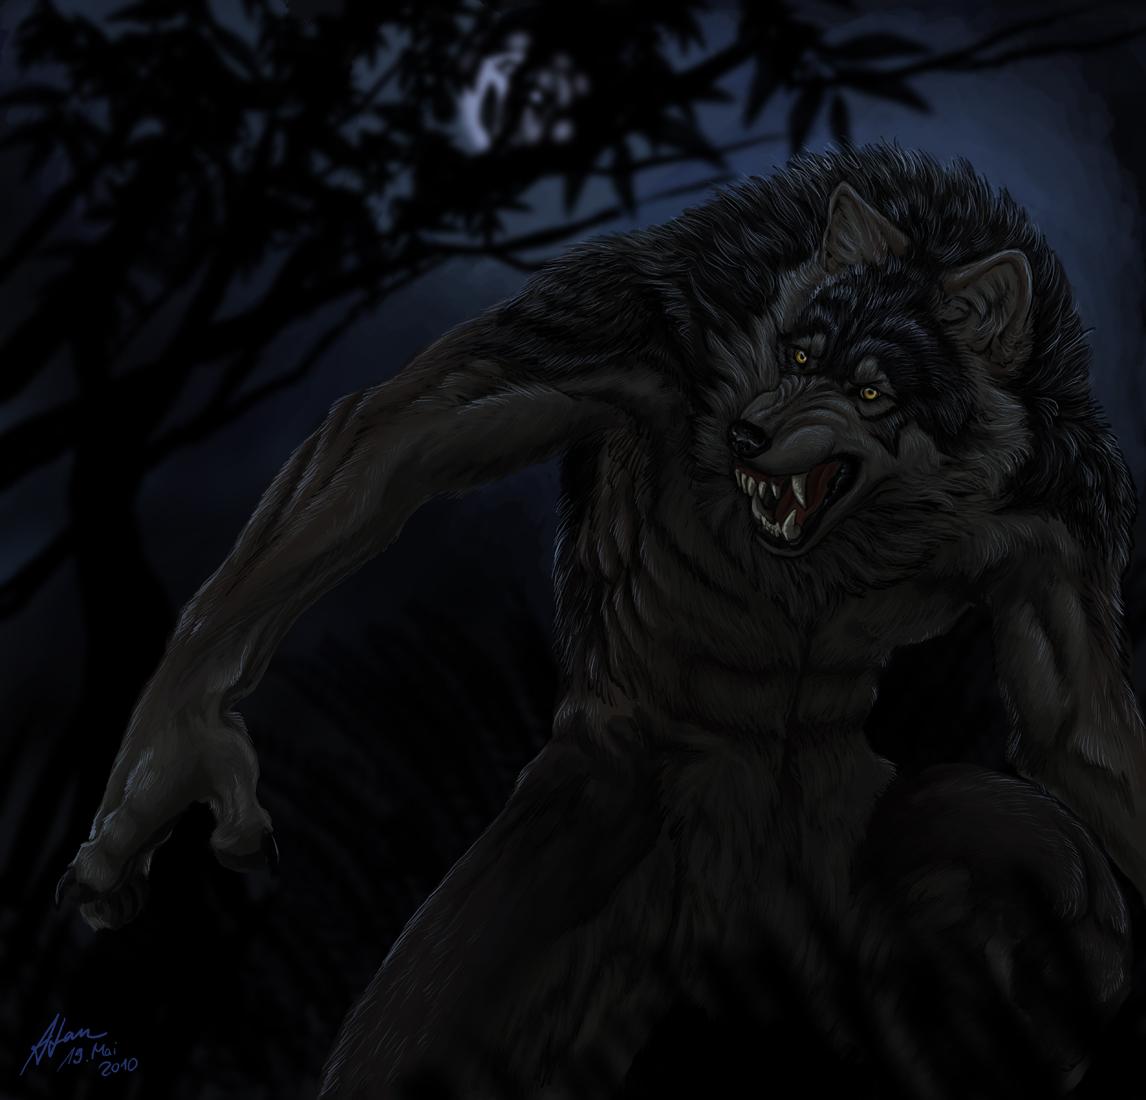 Through the night by Atan